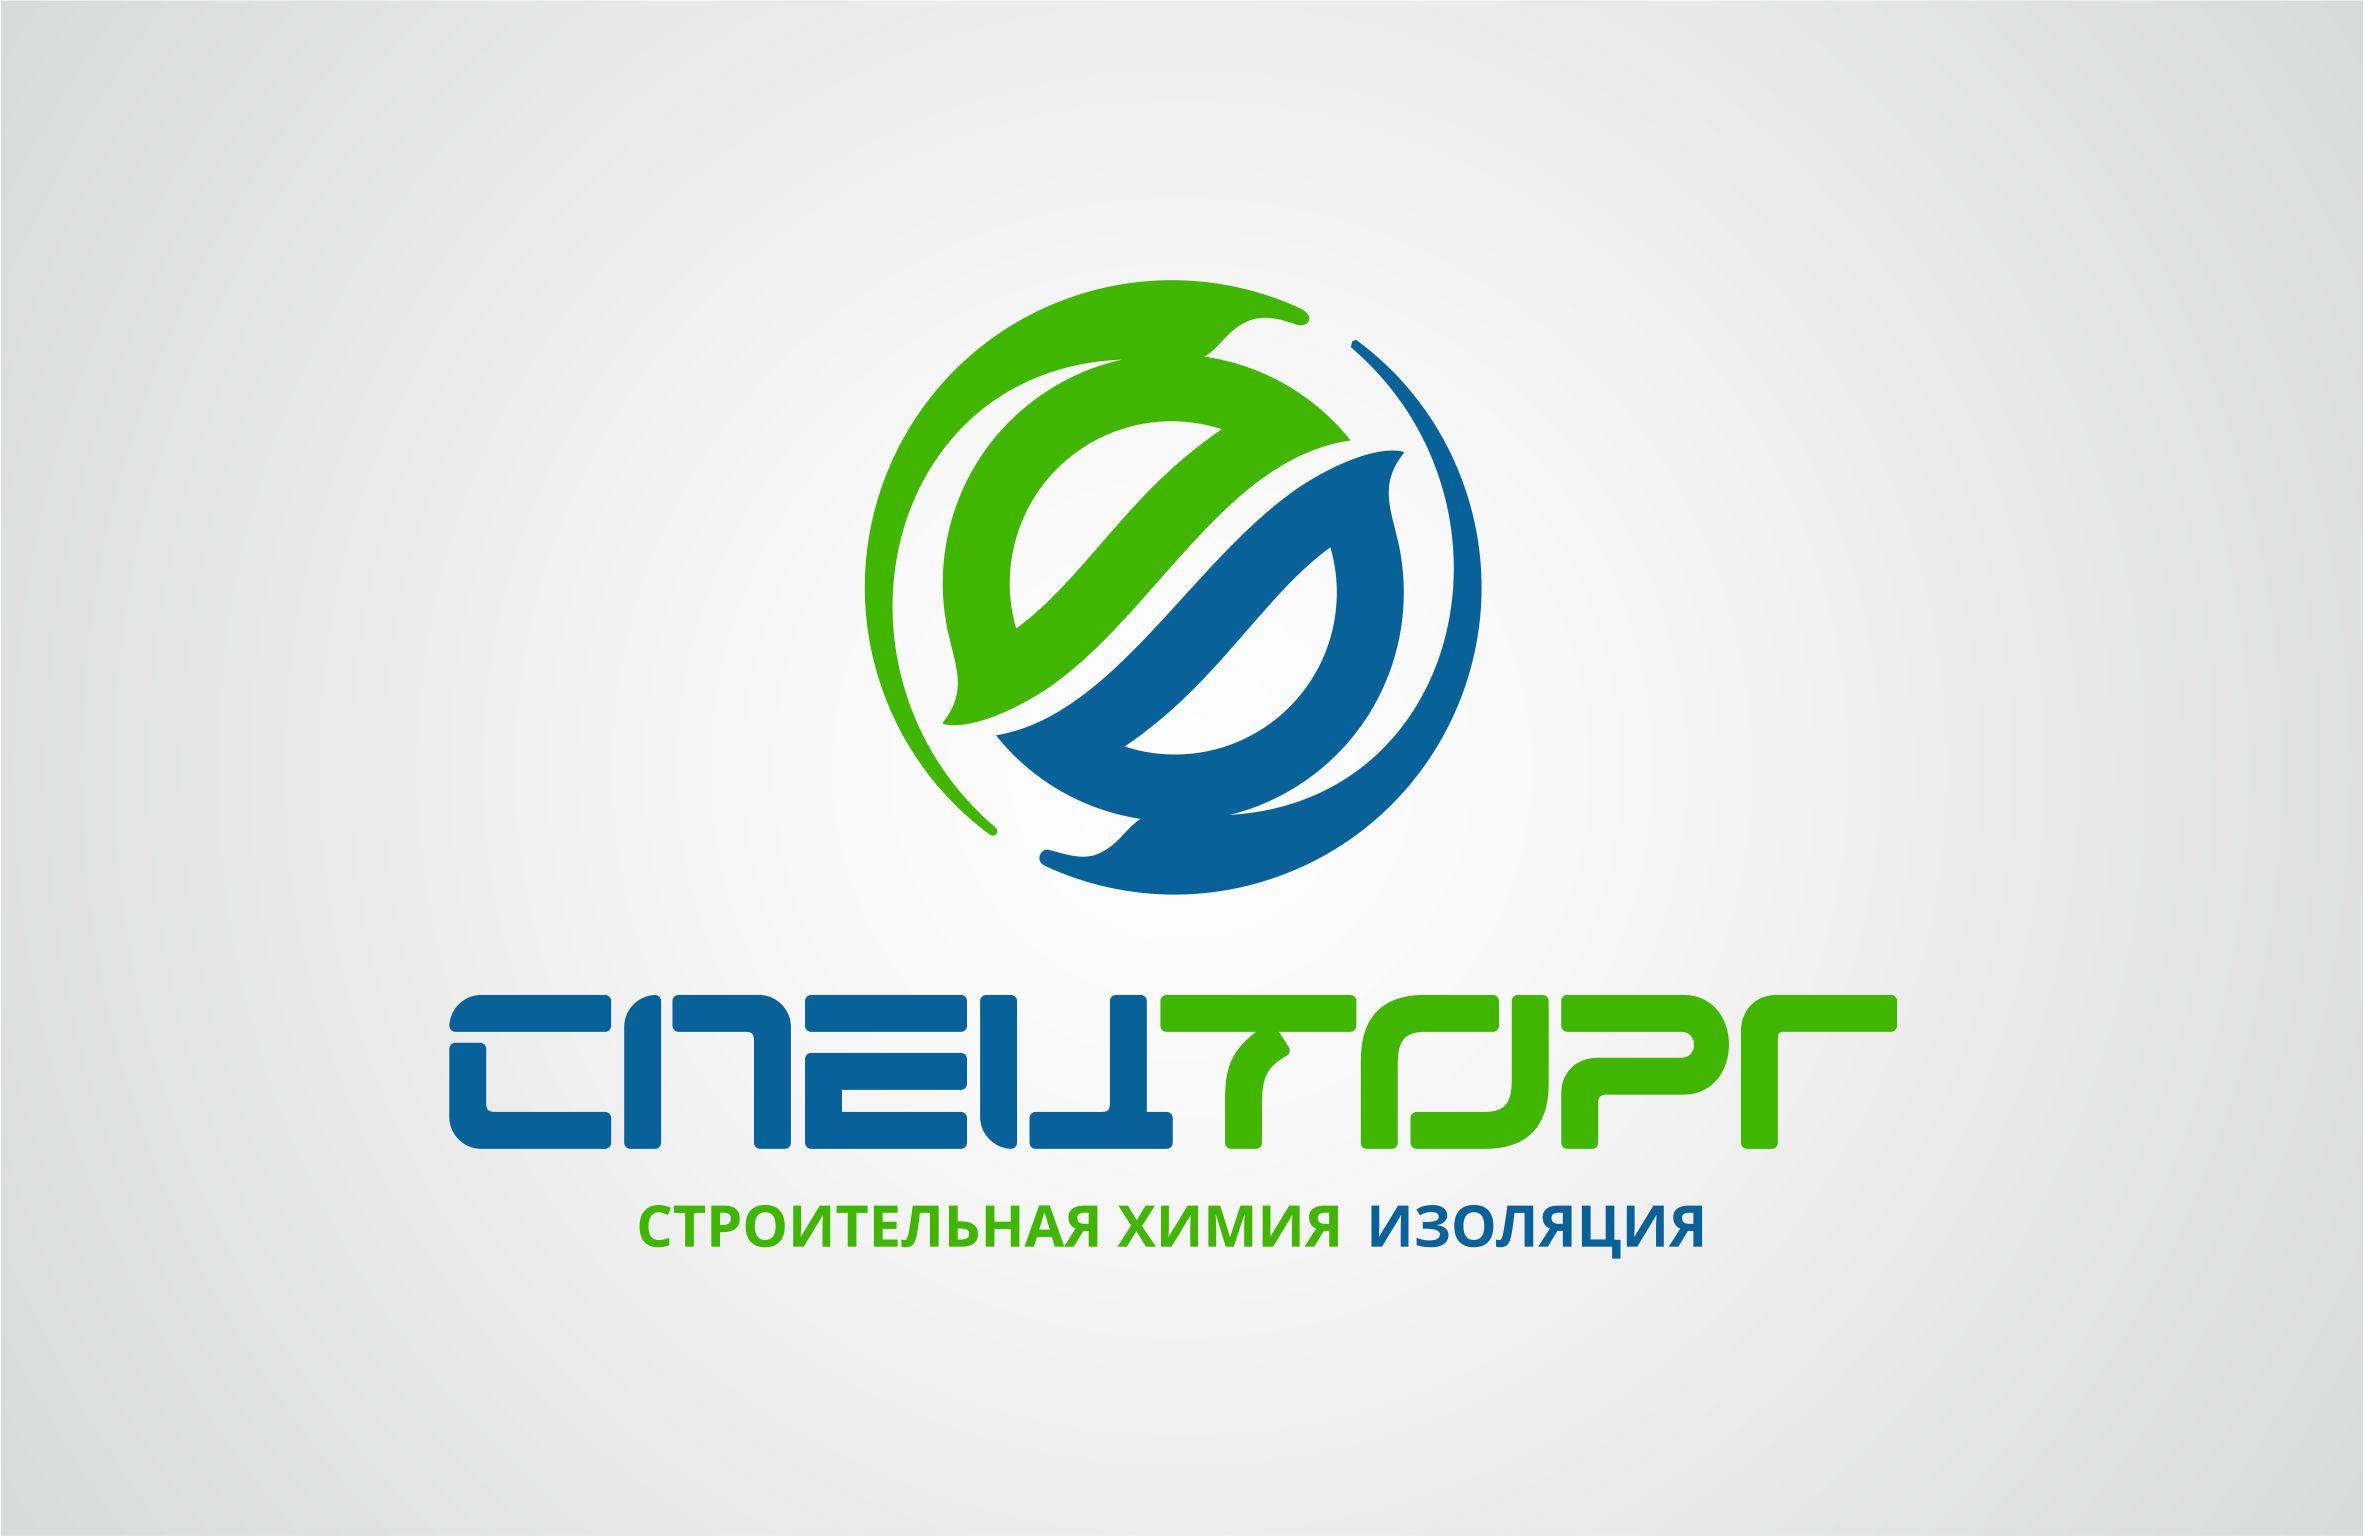 Разработать дизайн  логотипа компании фото f_5525dc41eba1ed80.jpg